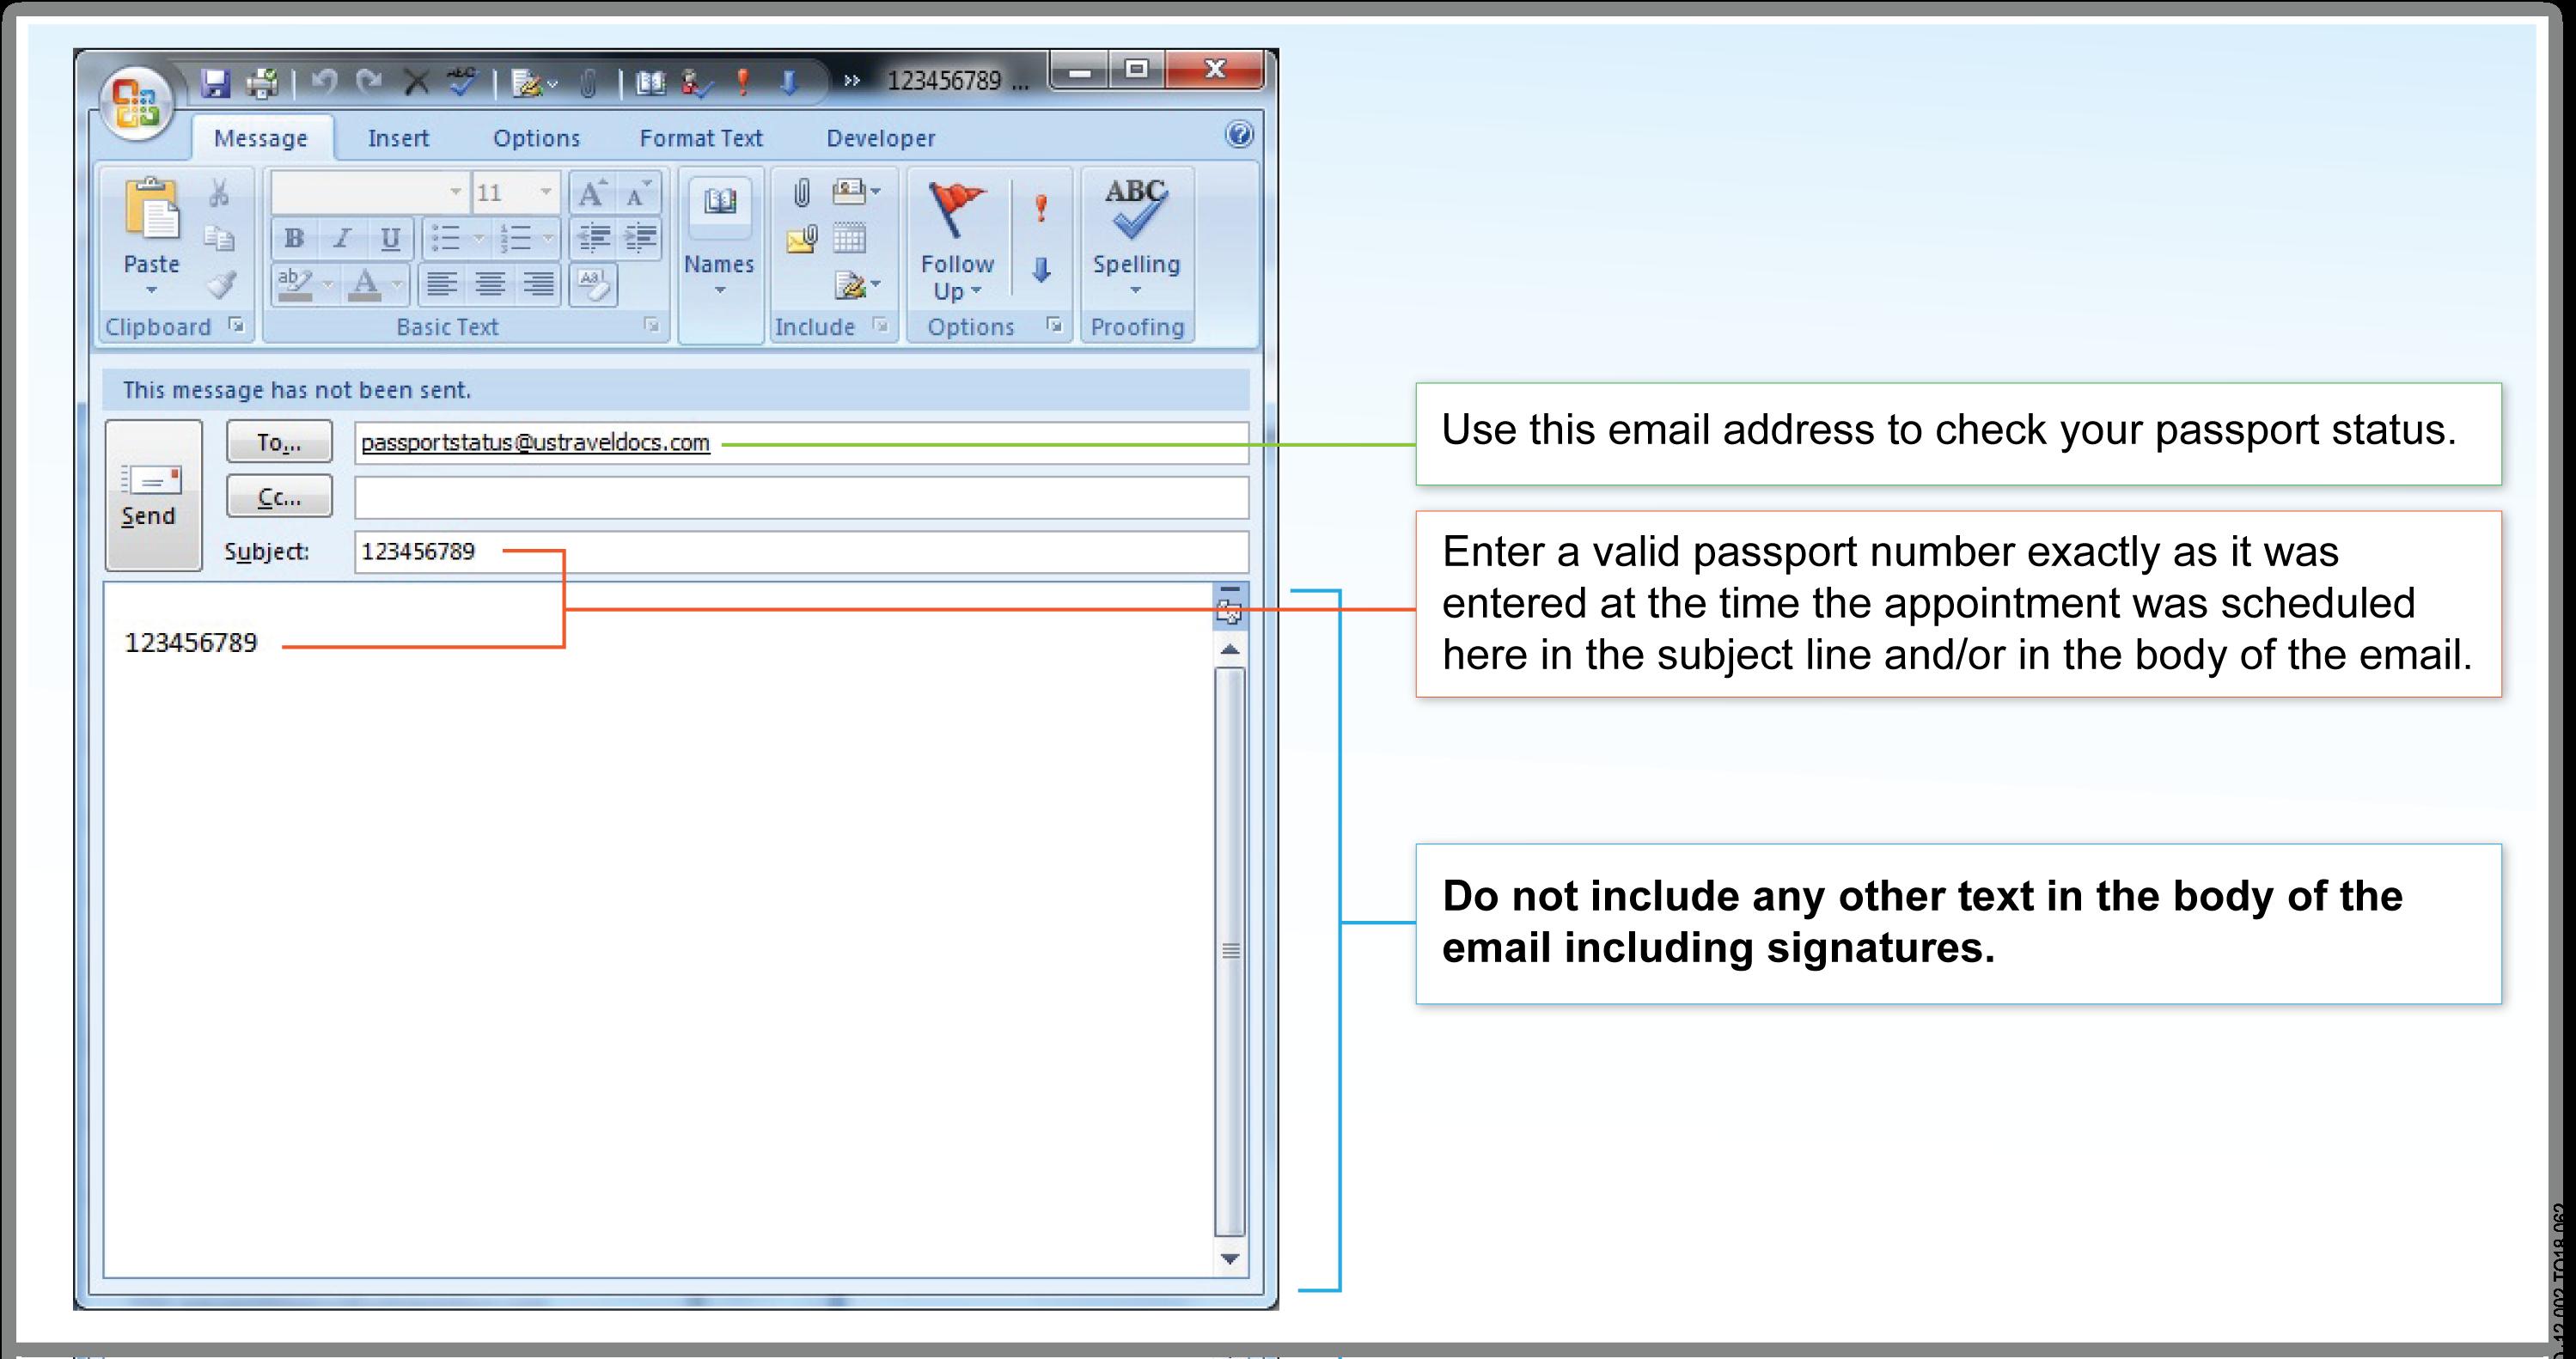 EmailGraphic - Jenis Jenis Visa Di Indonesia